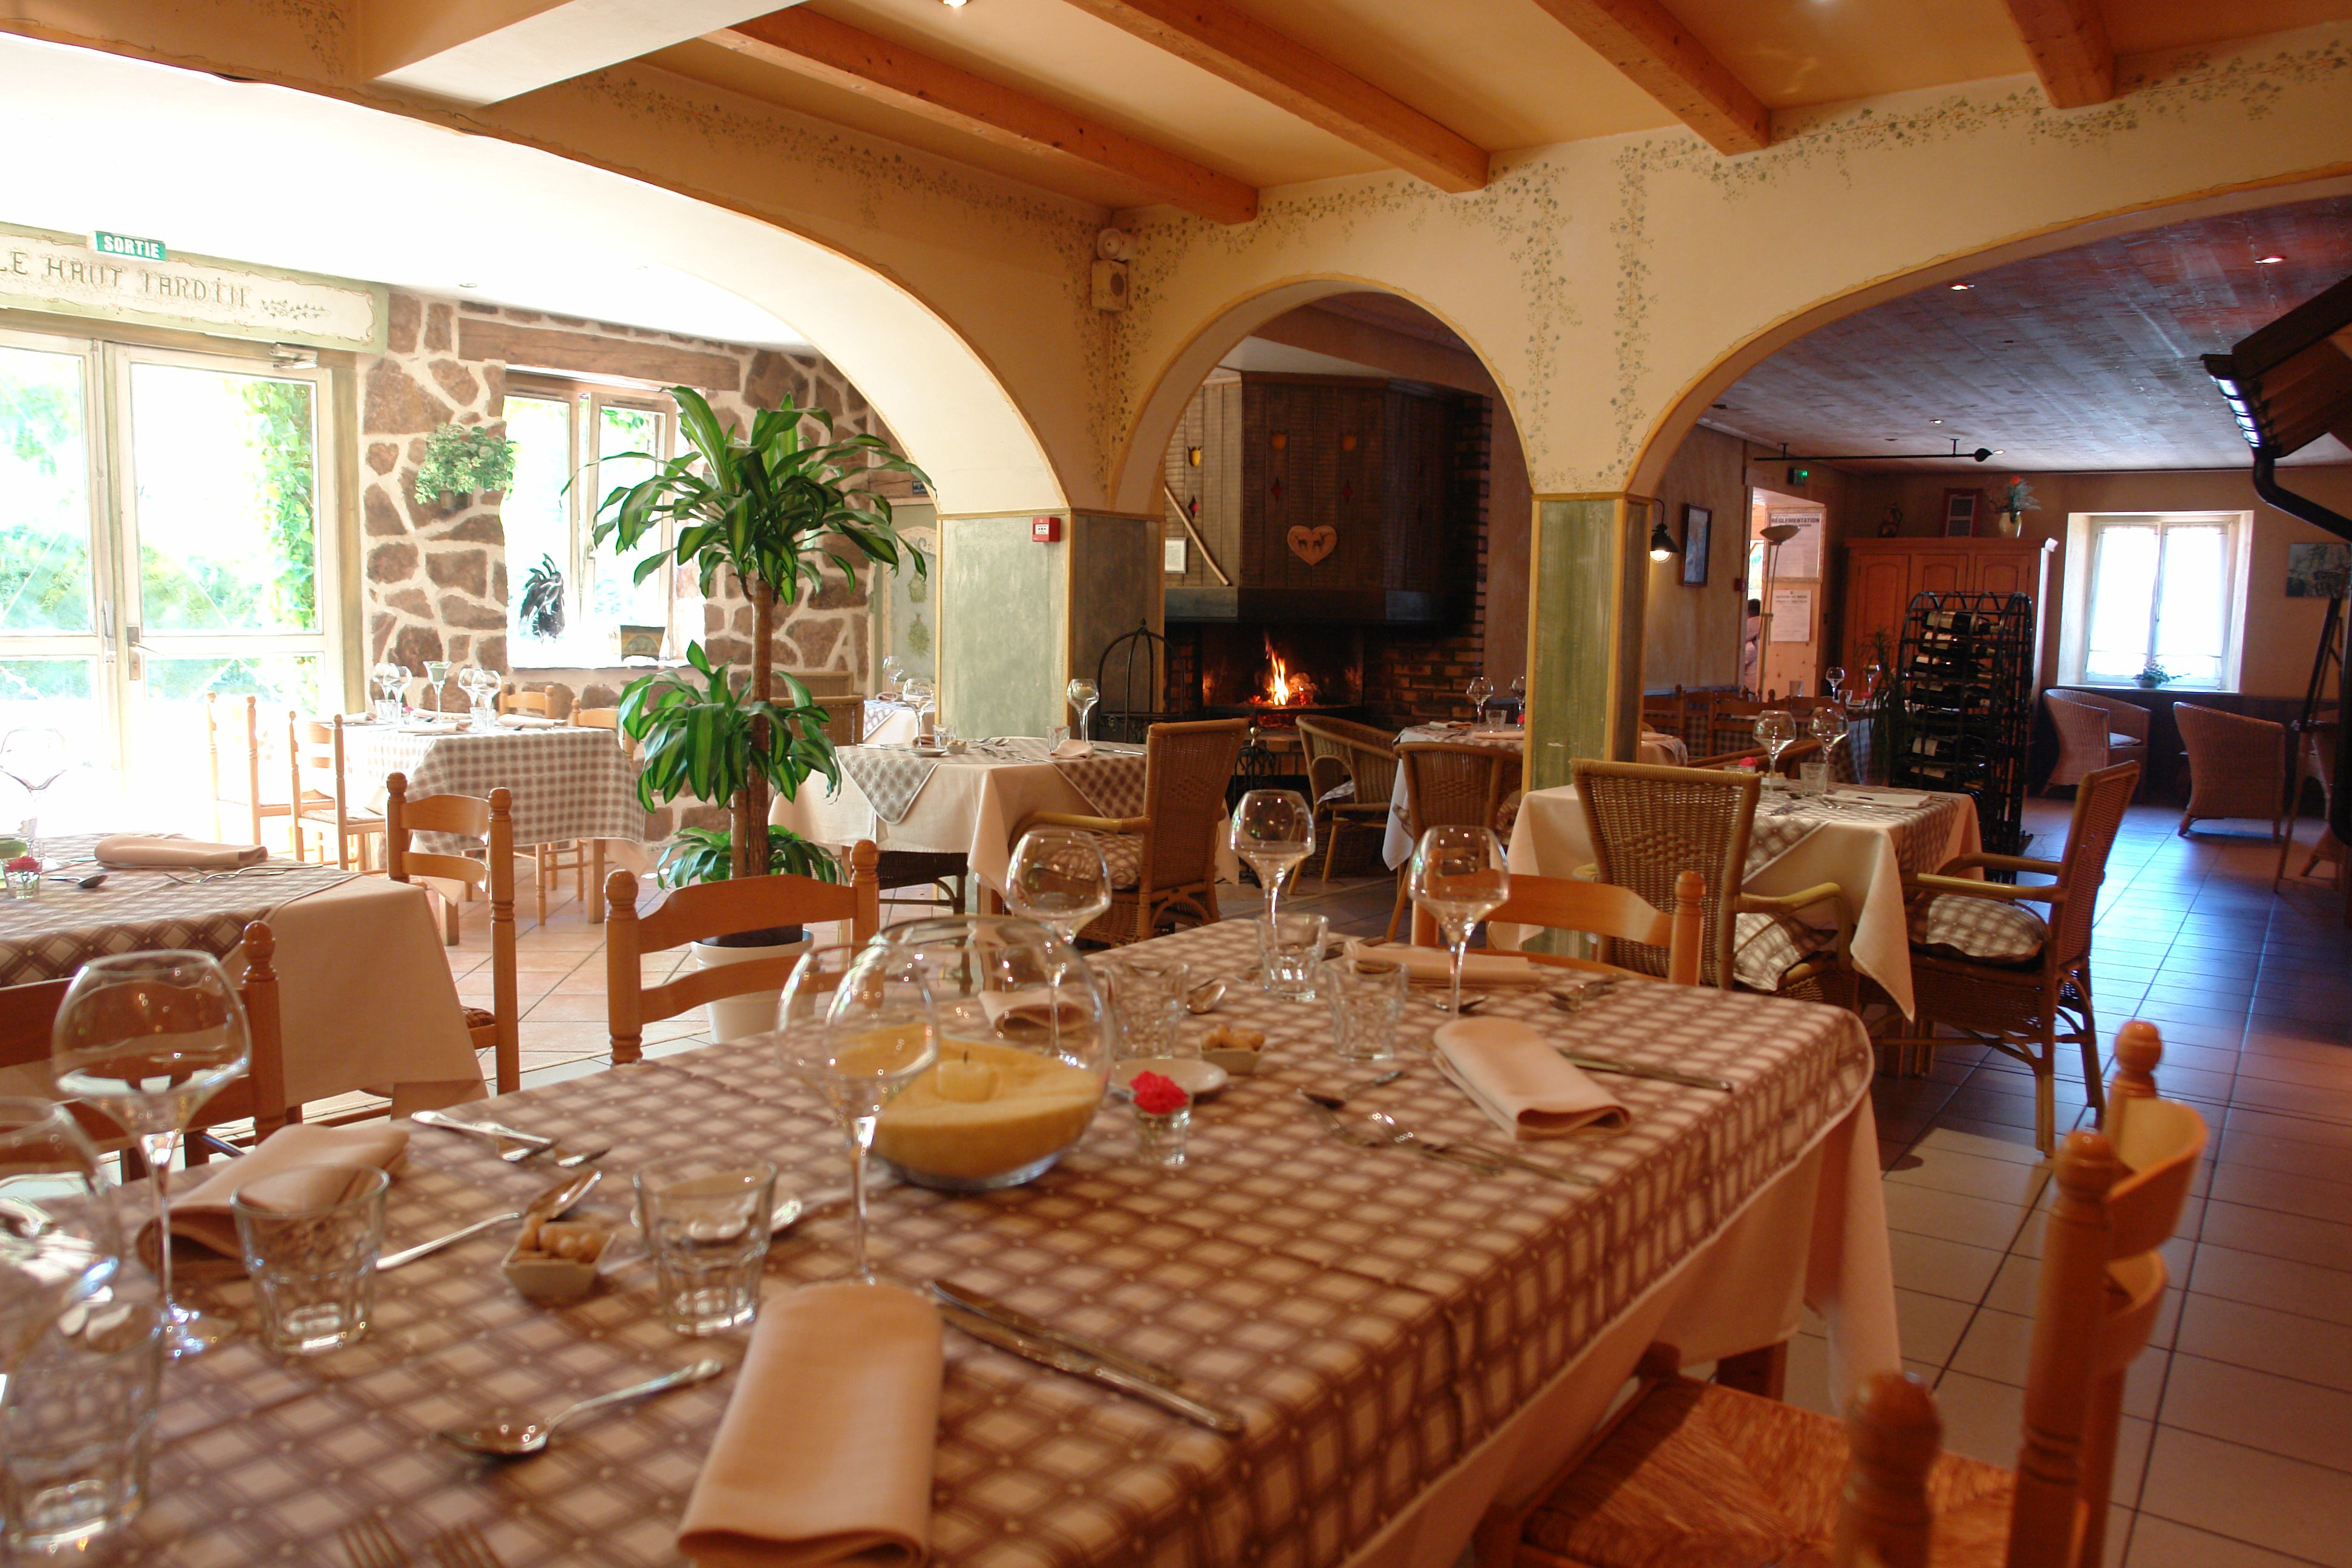 Cuisine du terroir 38 for Auberge du haut jardin